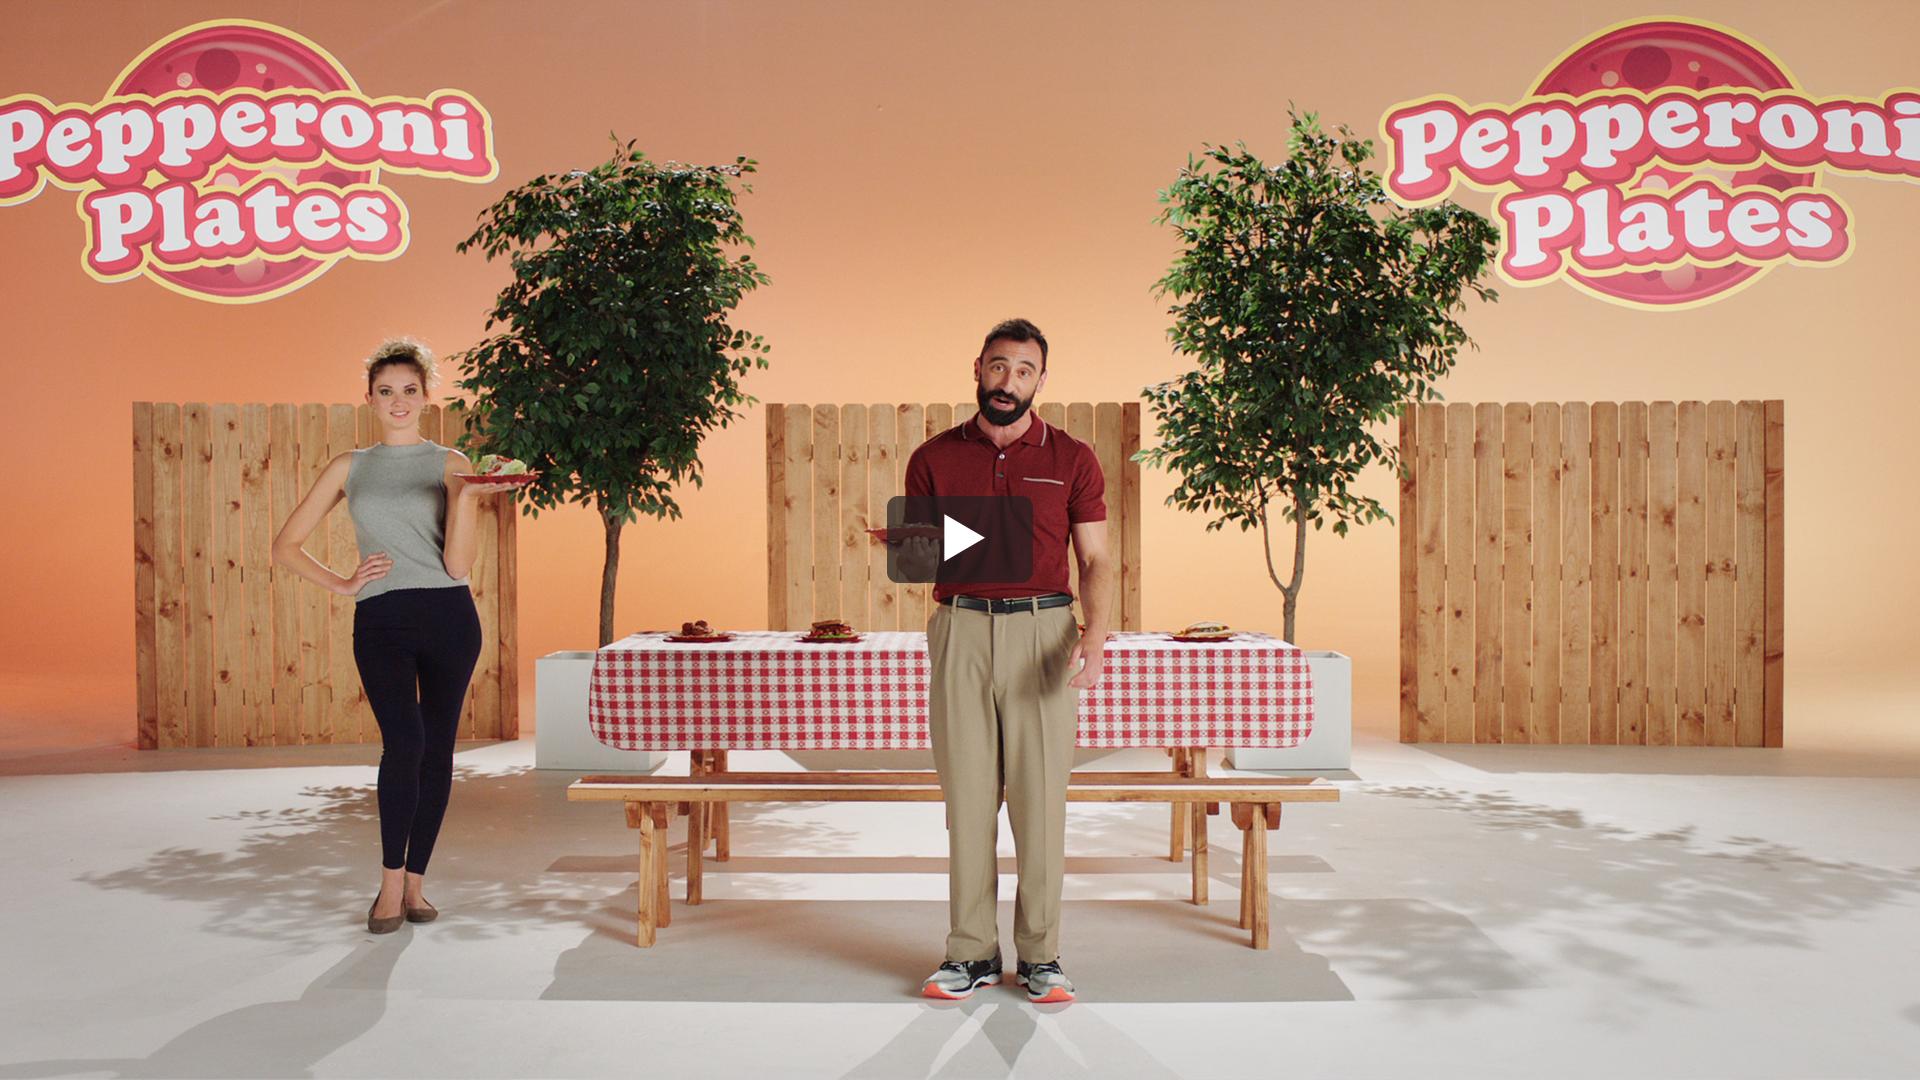 Pepperoni Plates®